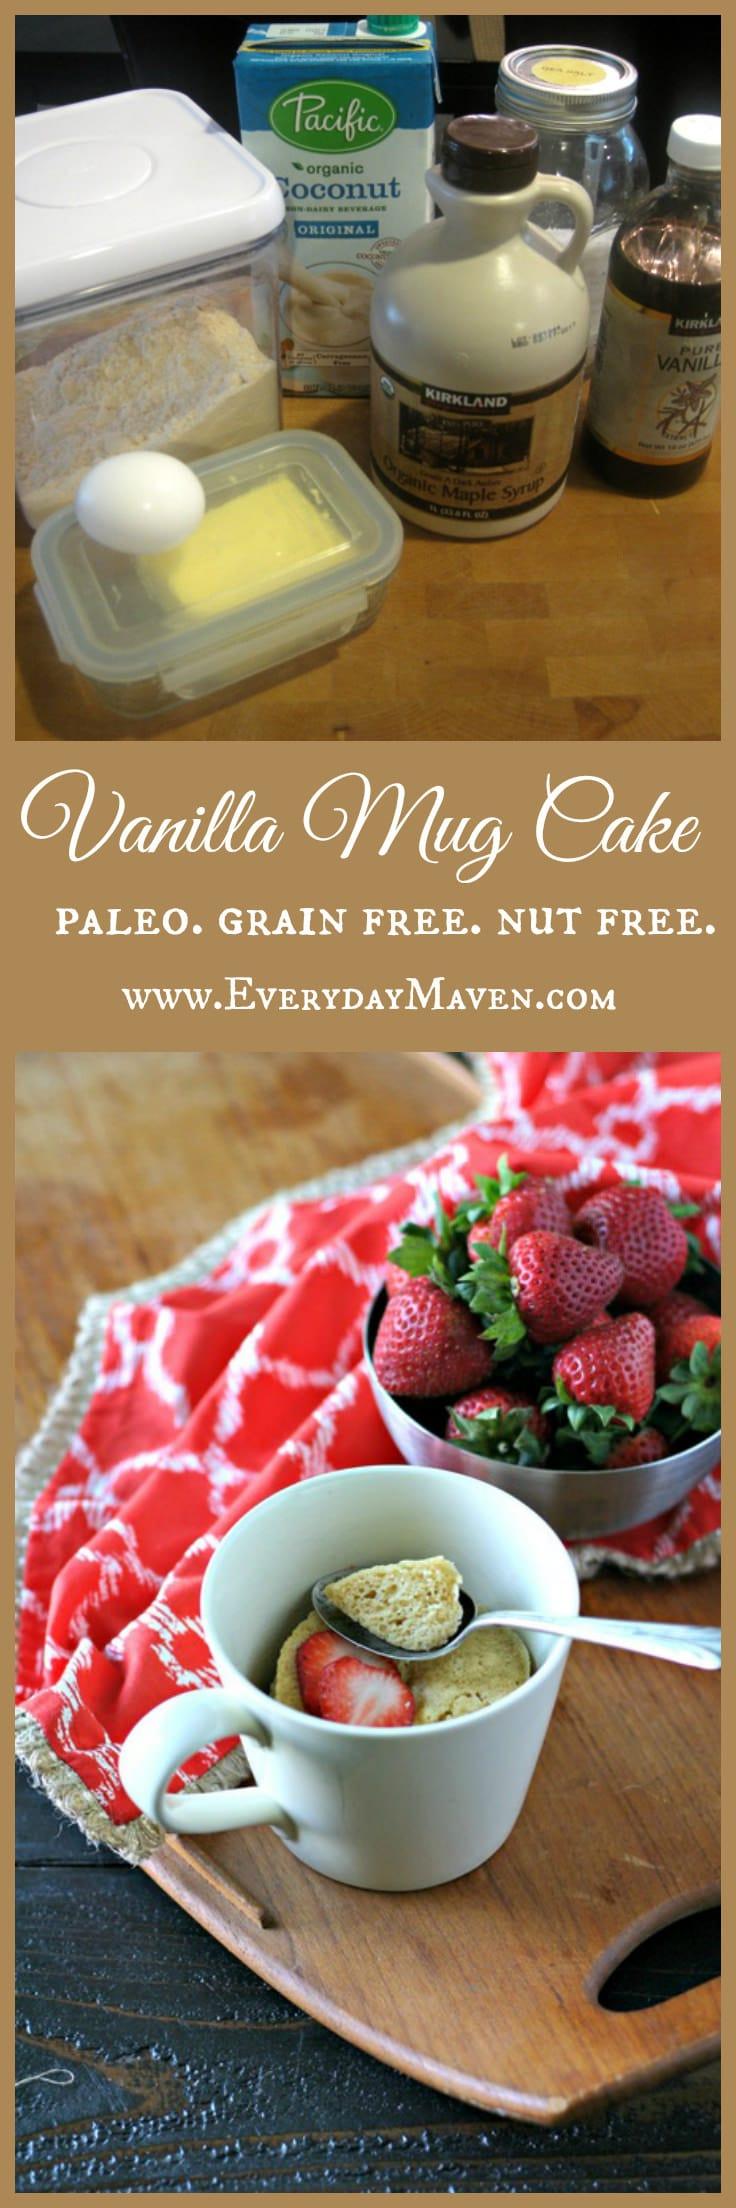 Paleo Vanilla Mug Cake  #NutFree #GrainFree #Paleo #MugCake #VanillaCake #GlutenFree #MicrowaveCake #Vanilla